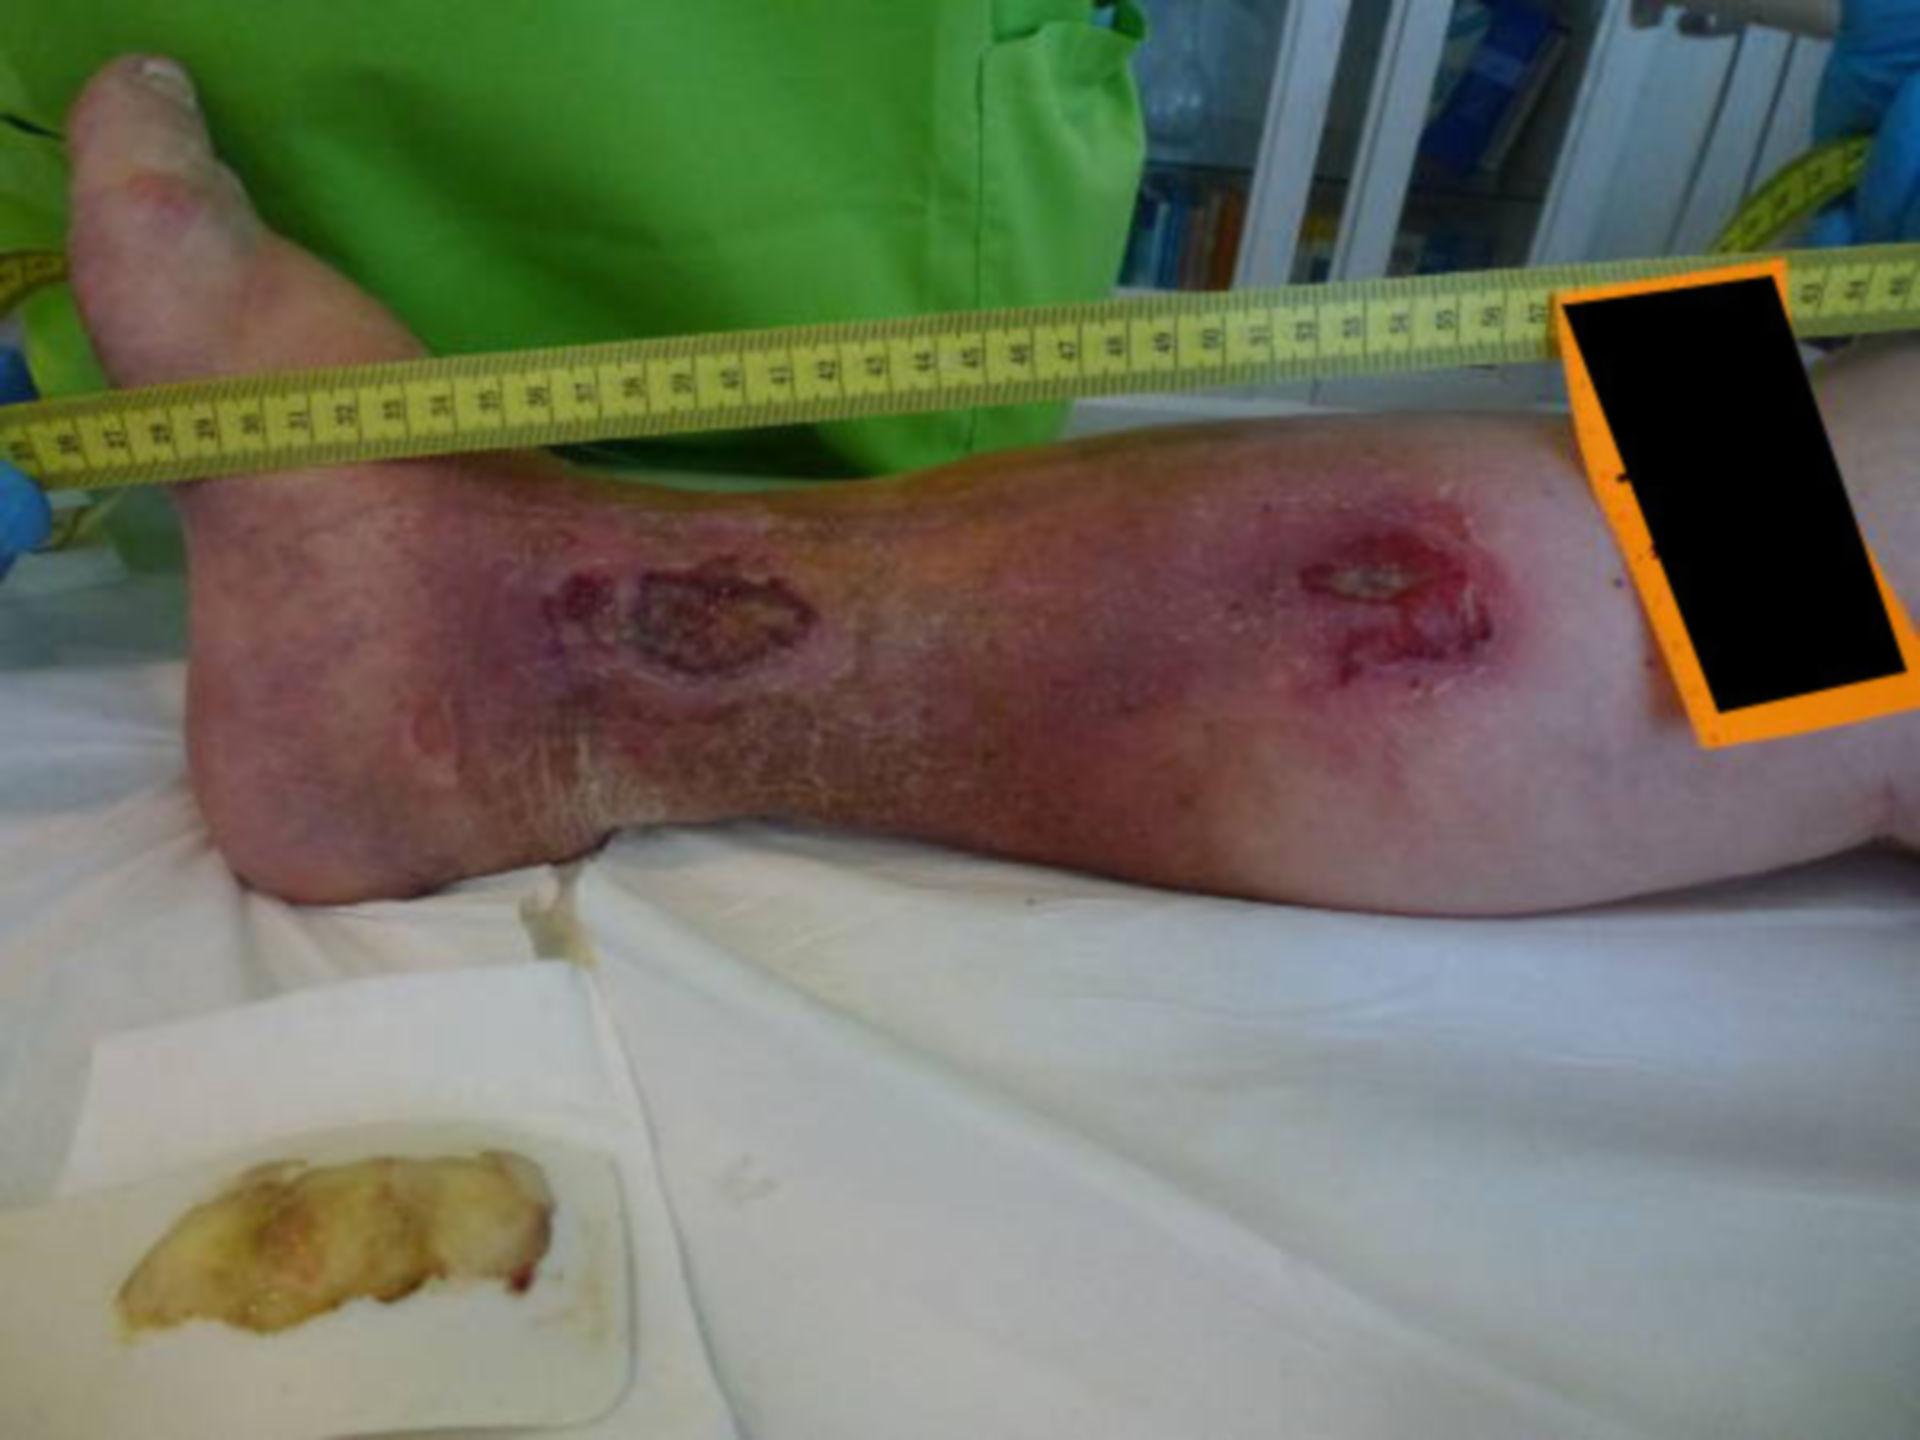 Distal ulcer: Cockett's ulcer